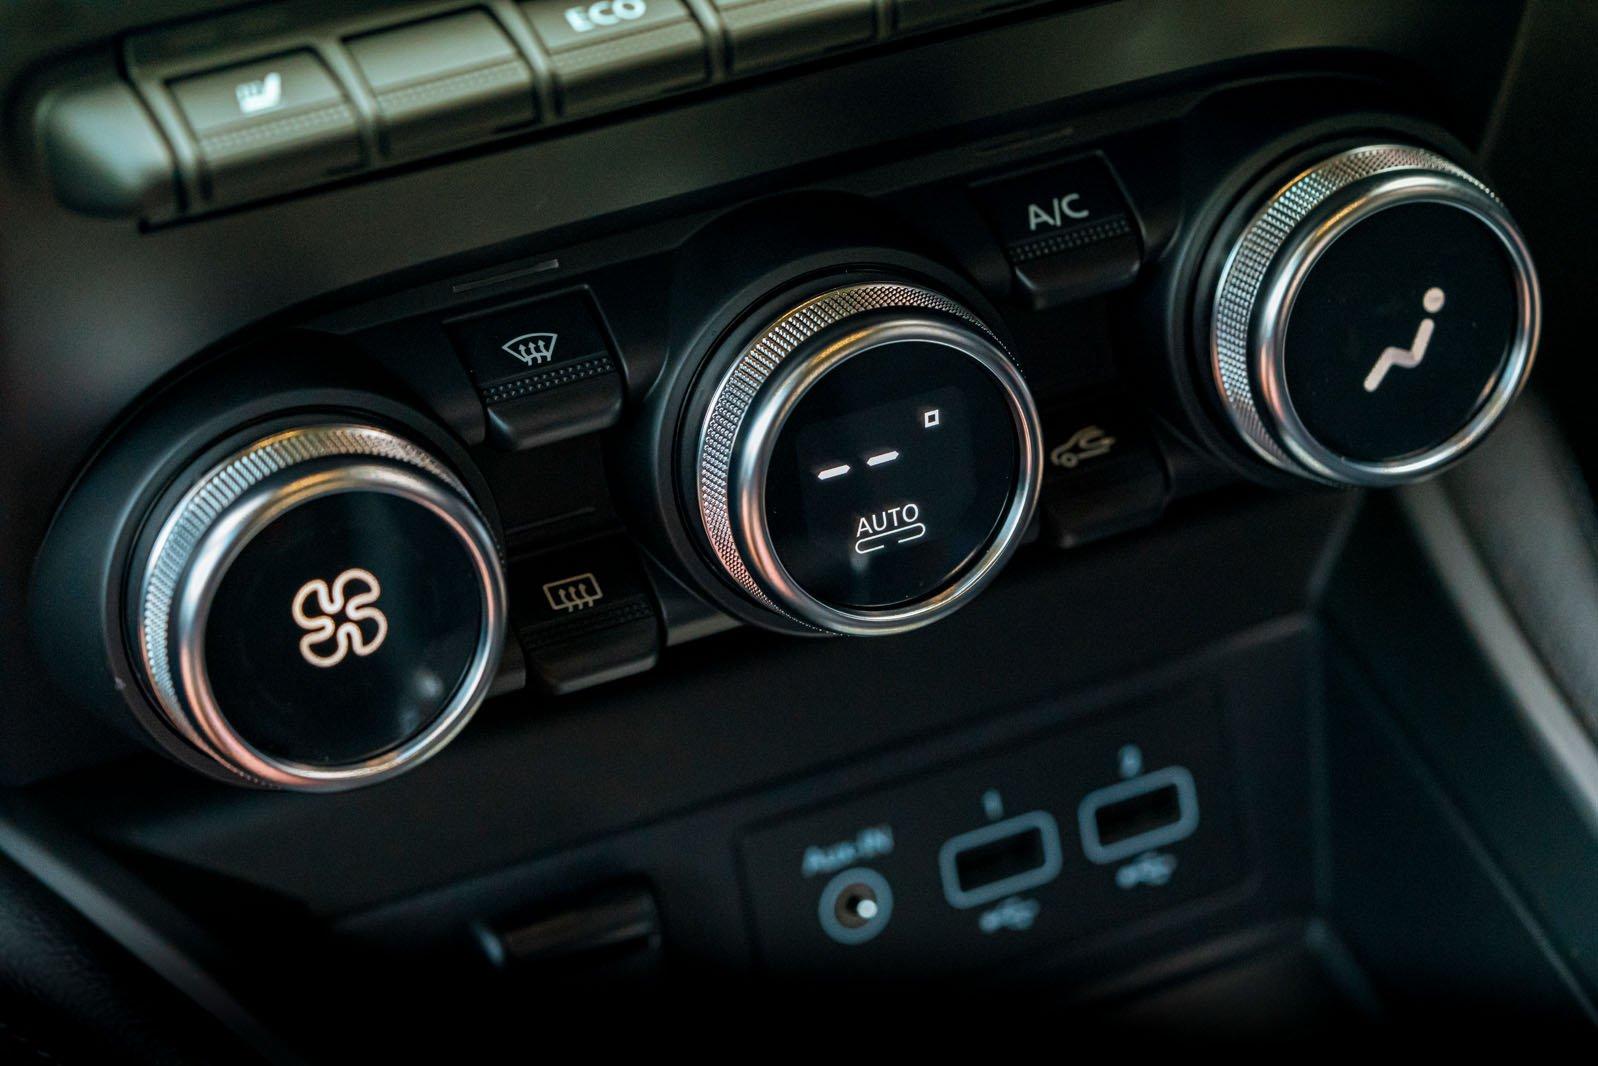 Renault Zoe 2020 RHD dashboard detail